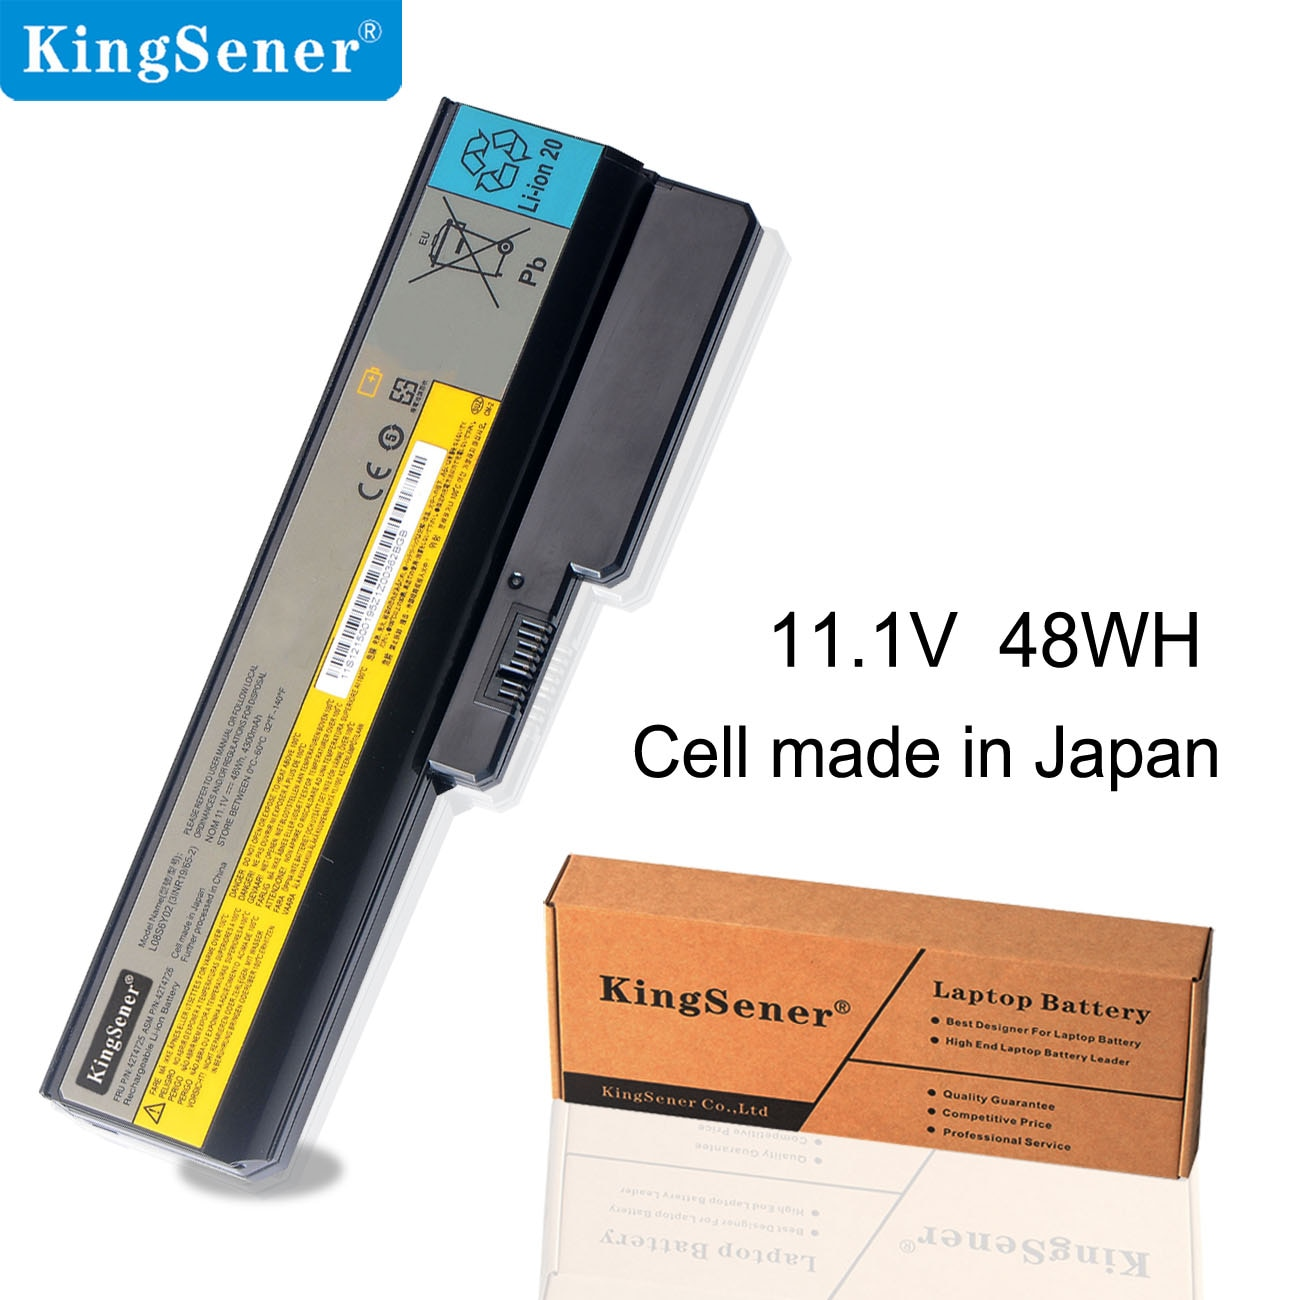 KingSener L08S6Y02 محمول بطارية لأجهزة لينوفو 3000 G430 G450 G530 G550 N500 Z360 B460 B550 V460 V450 G455 G555 G450M L08L6Y02